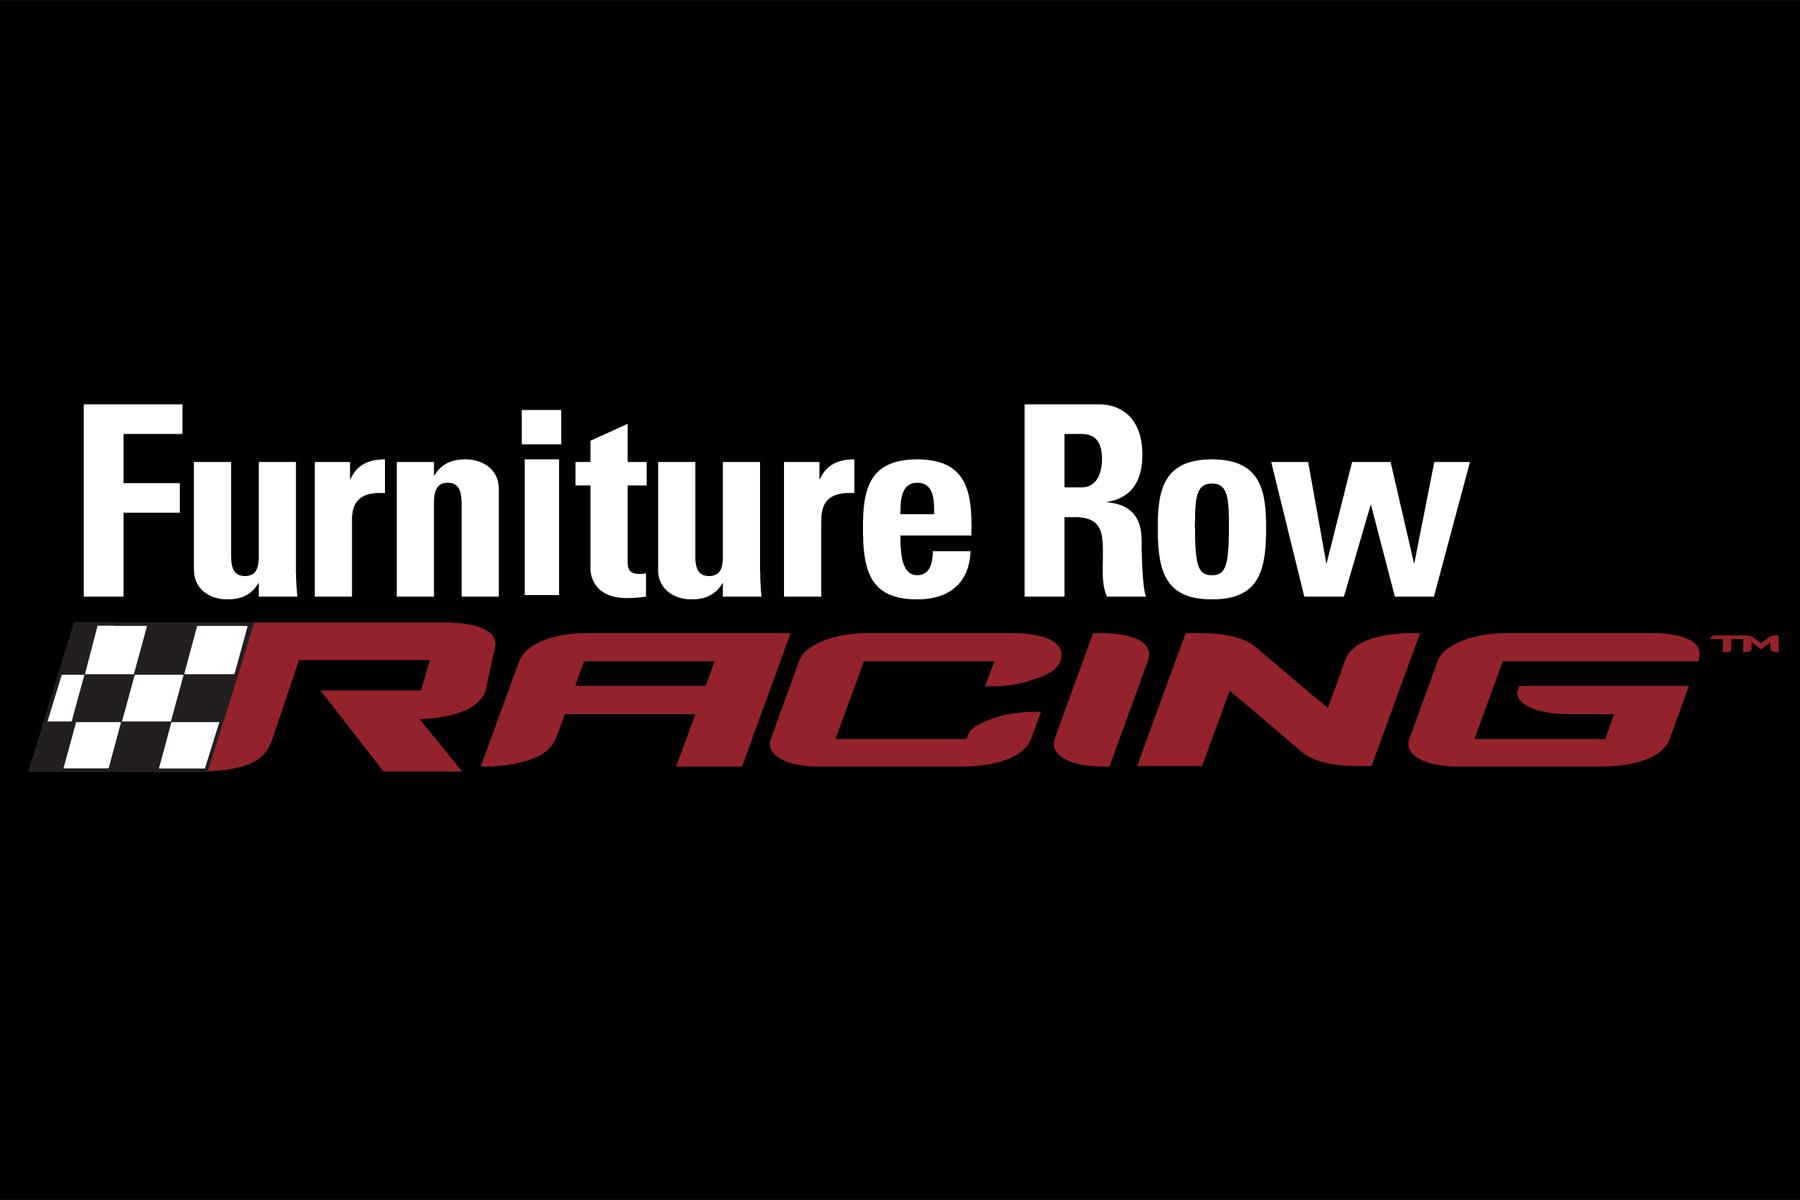 Wix Filters Announces Partnership With Furniture Row Racing Big